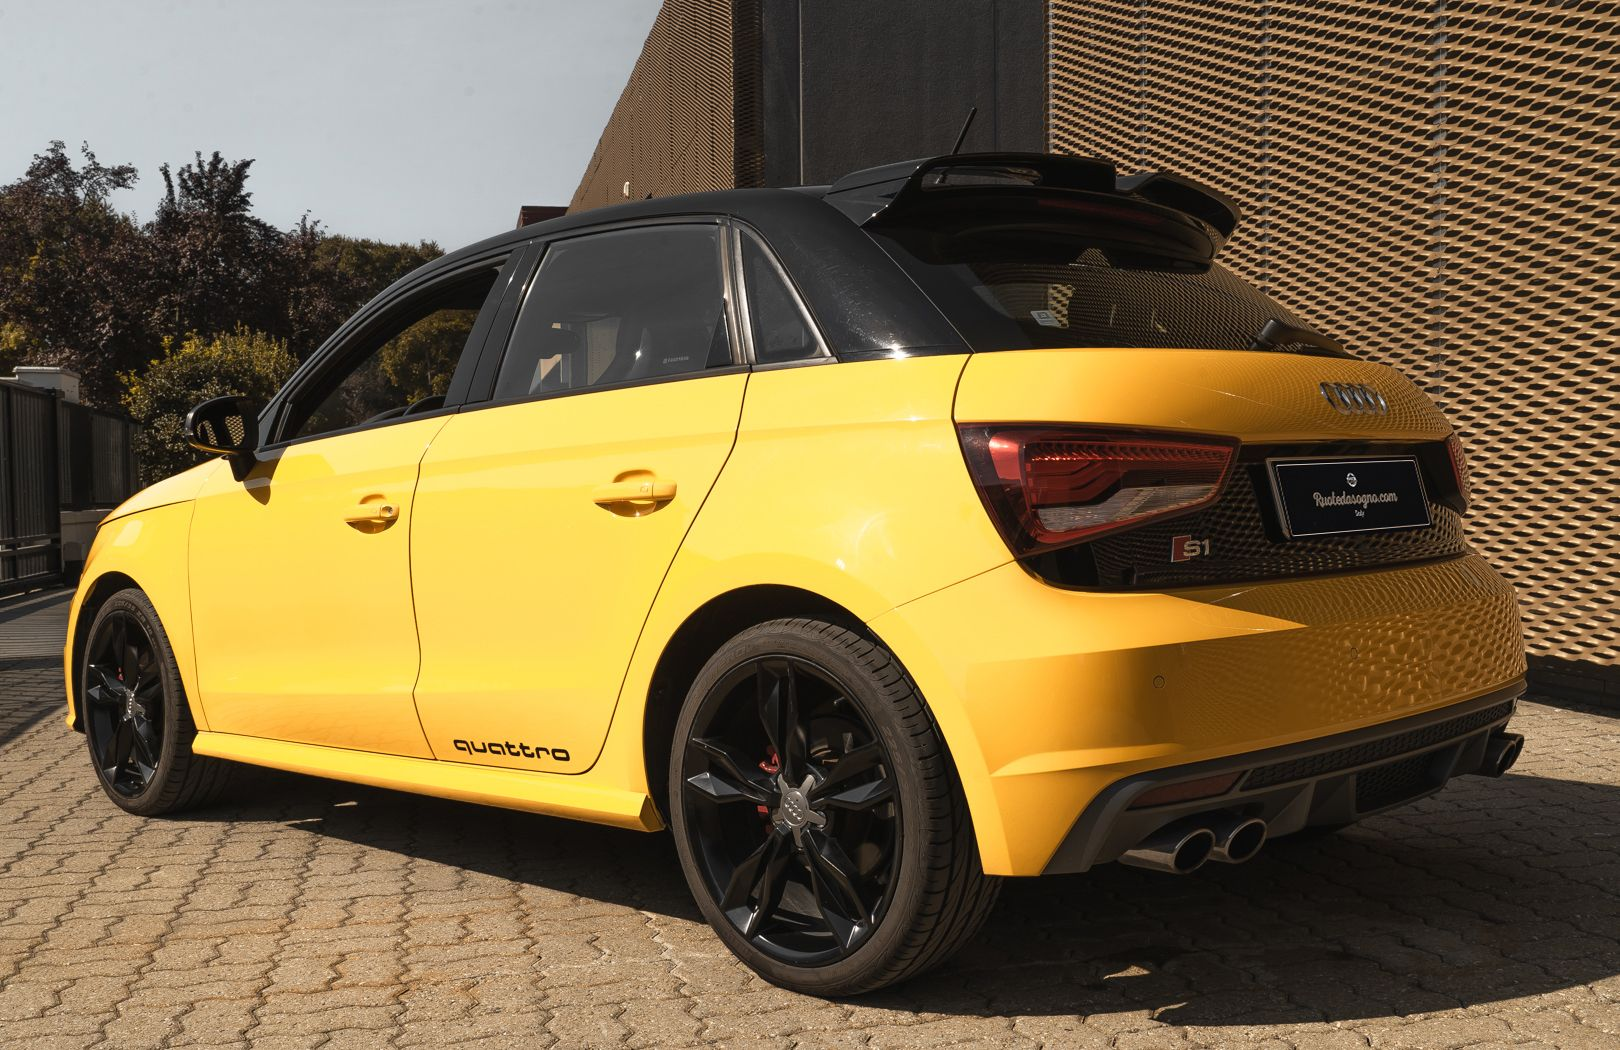 2014 Audi S1 Sportback 2.0 TFSI Quattro 83612